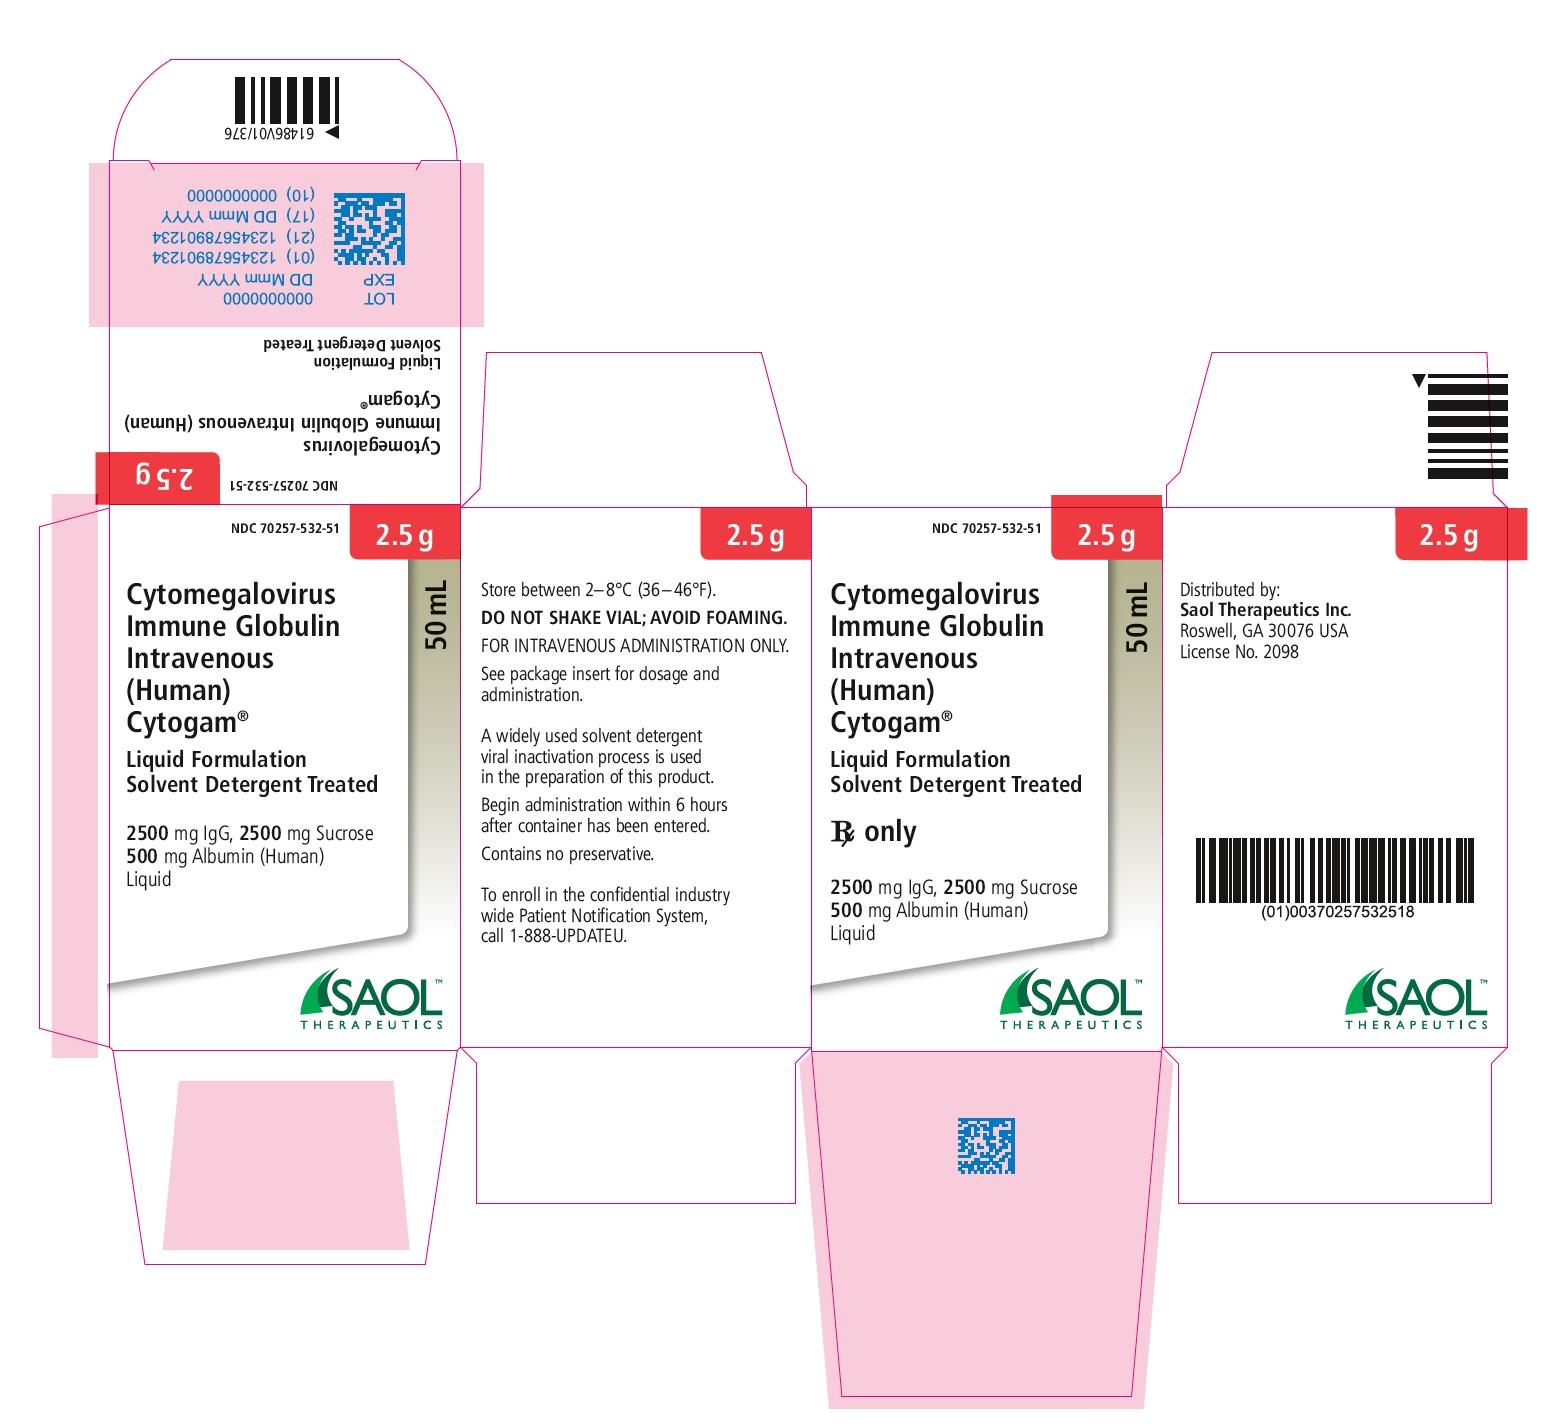 2.5g Carton label